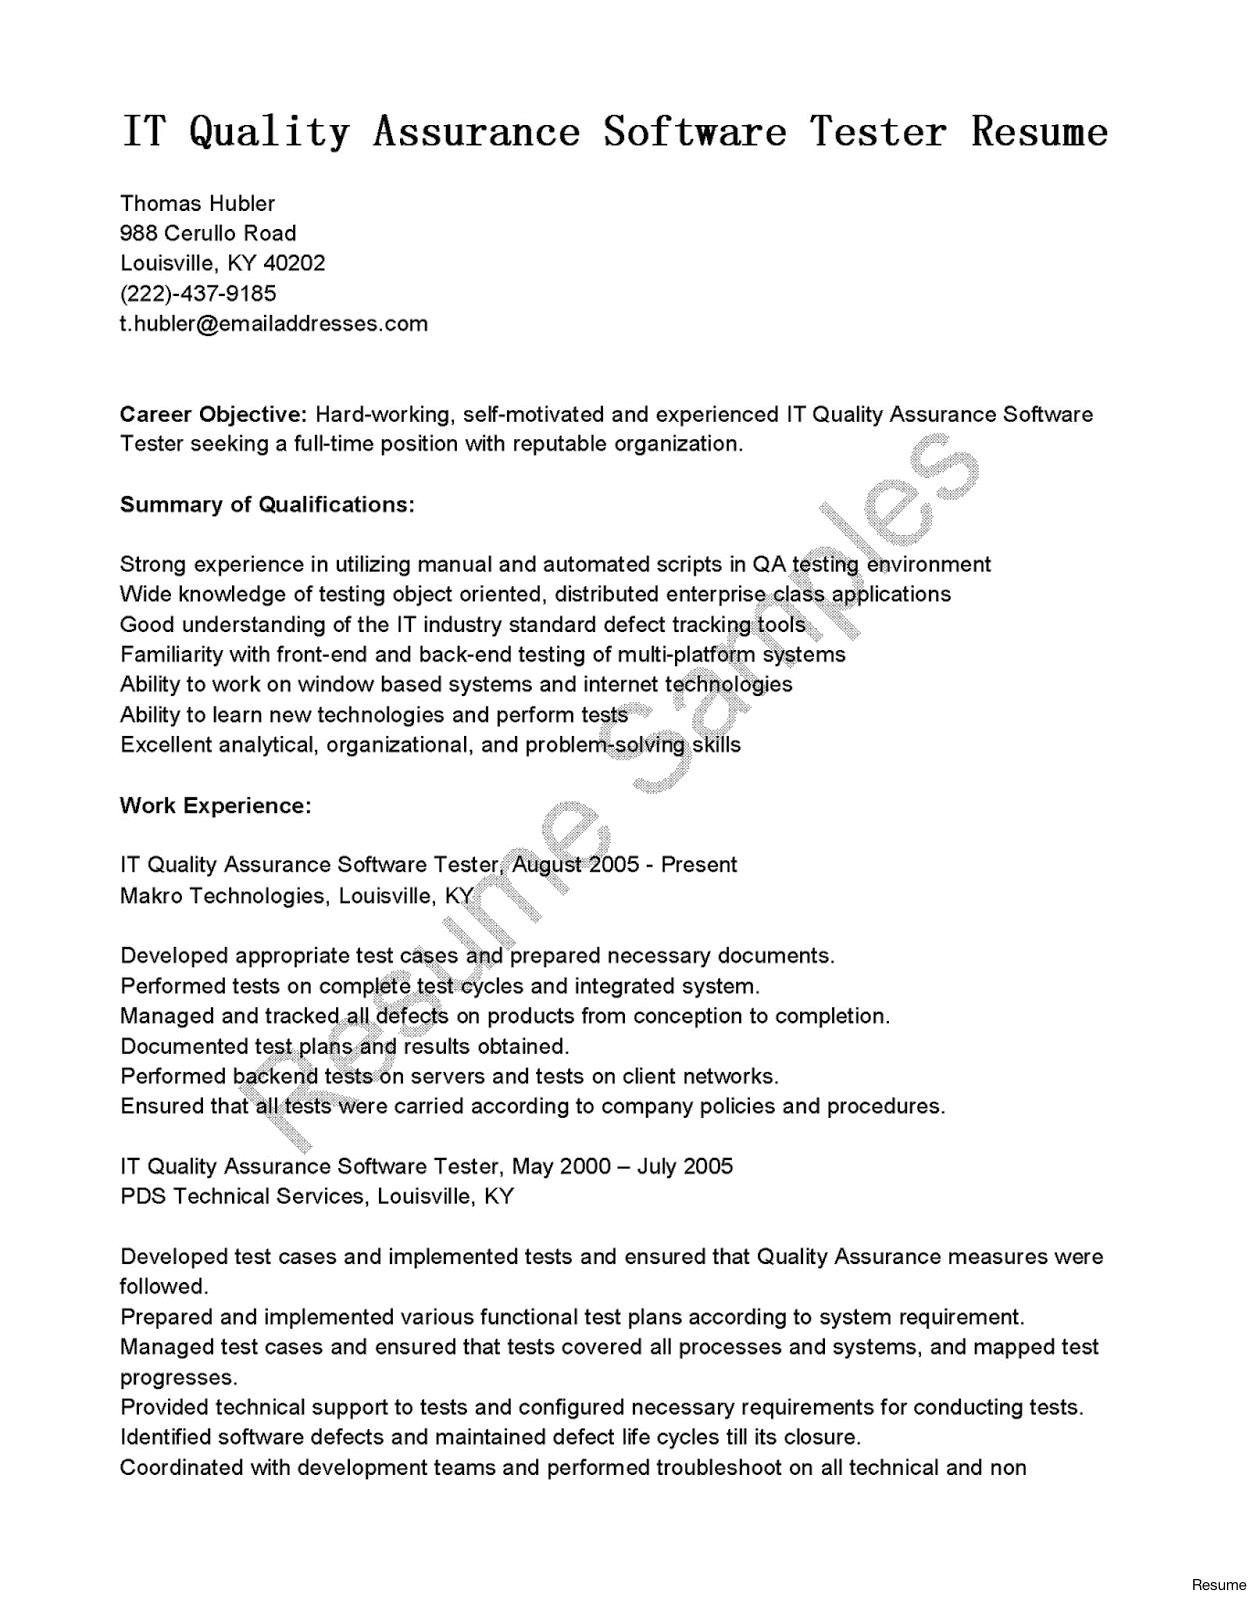 sqa resume sample awesome software testers resume tester sample skills